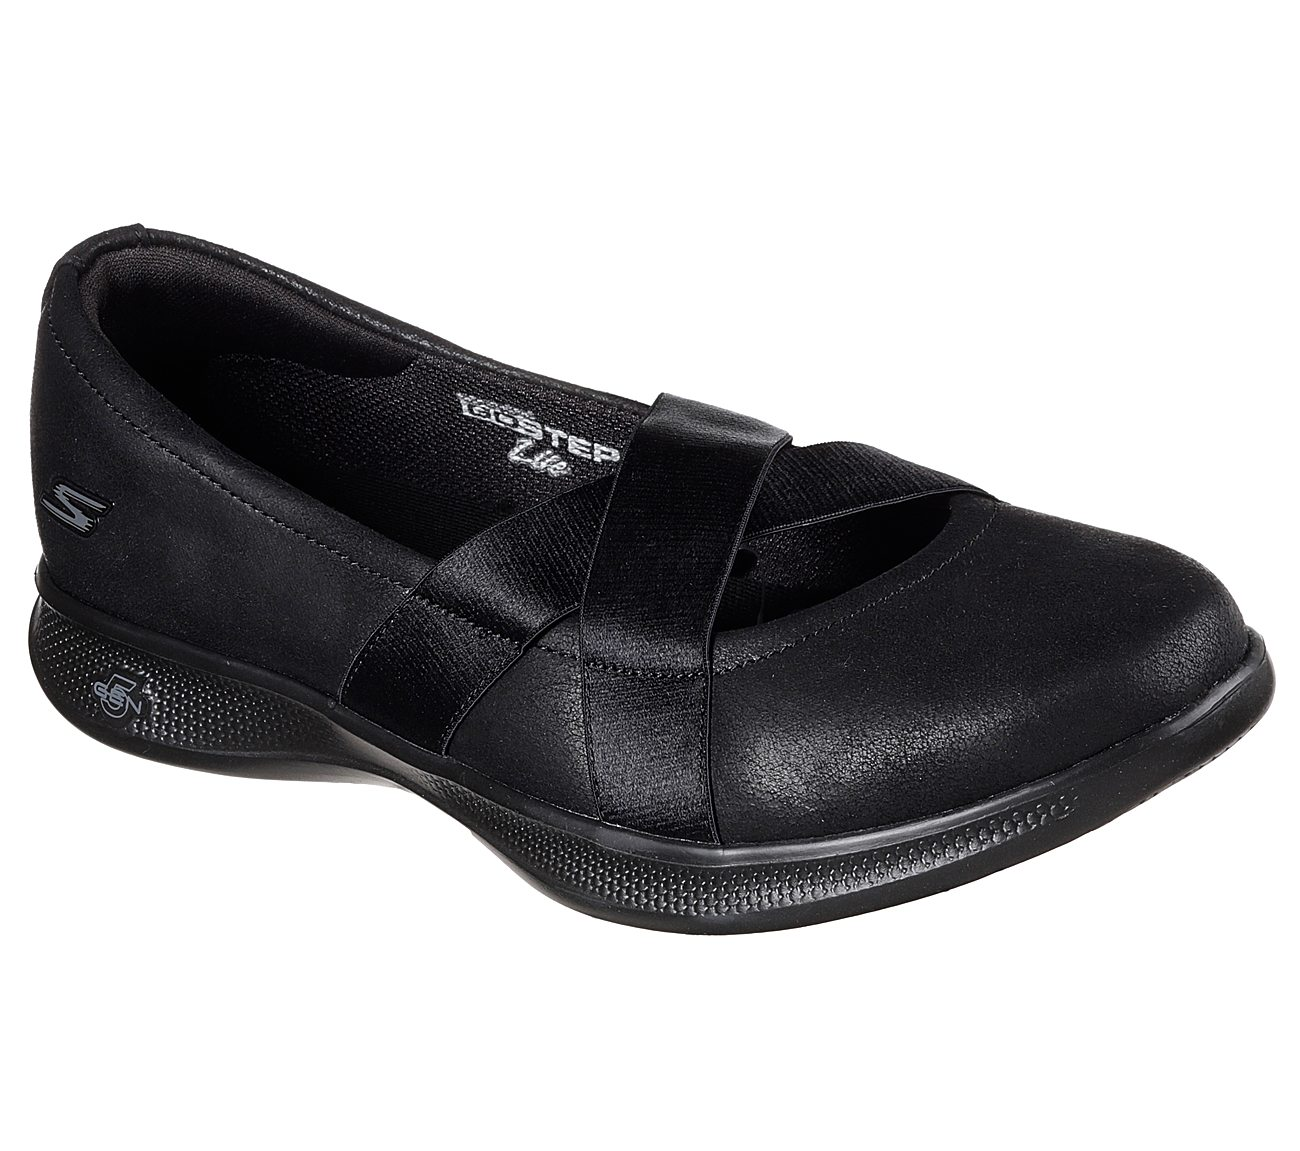 SKECHERS Womens Go Step Lite Lovely Shoes Black oRnNYQX